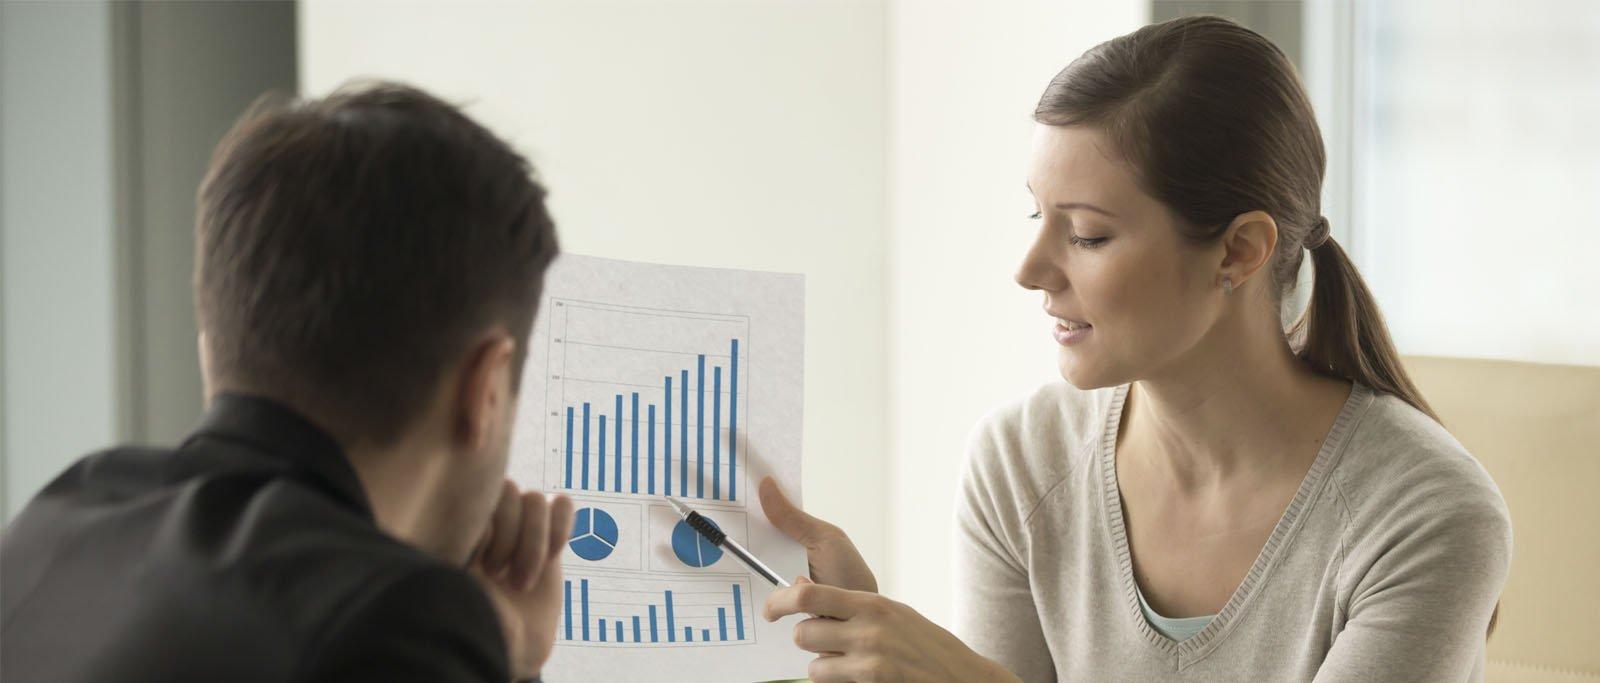 Saiba como calcular metas de vendas para vendedores na prática